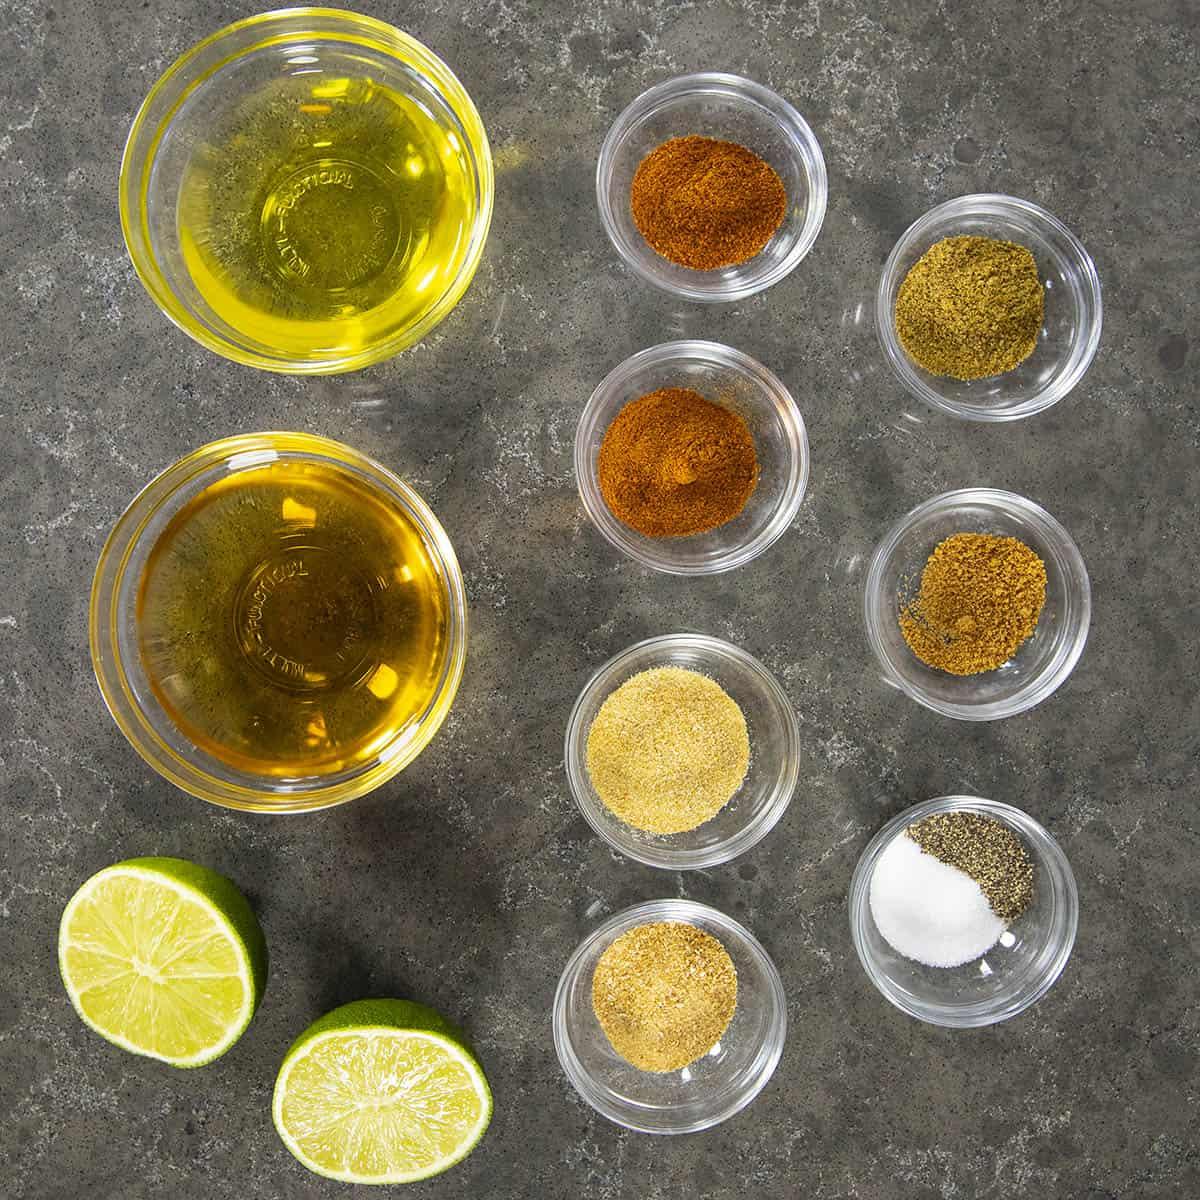 Cowboy Caviar Vinaigrette Ingredients